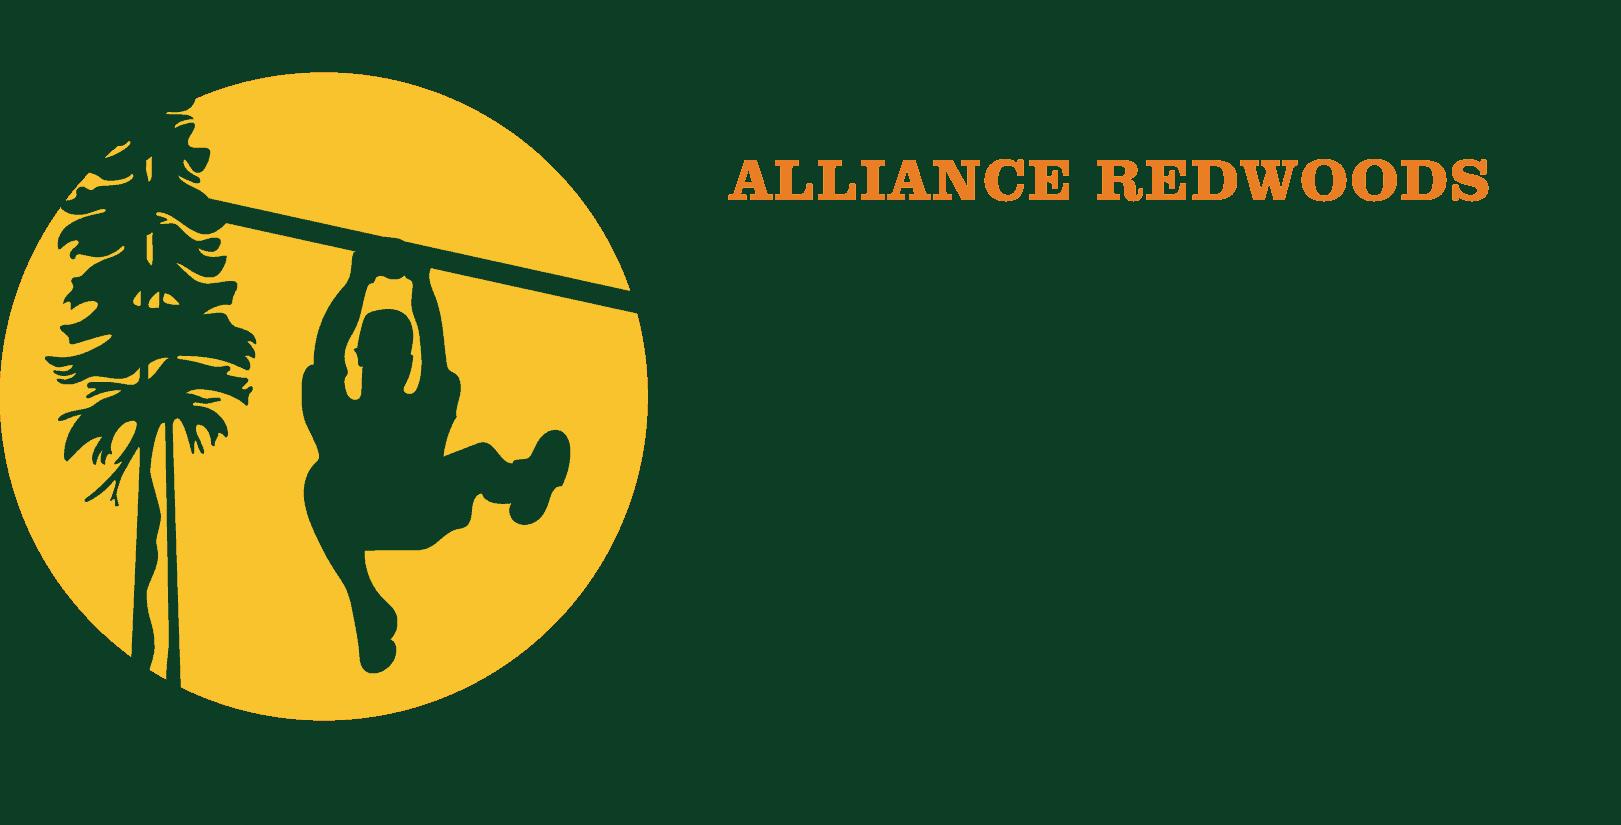 Alliance Redwoods Sonoma Zipline Adventures color logo